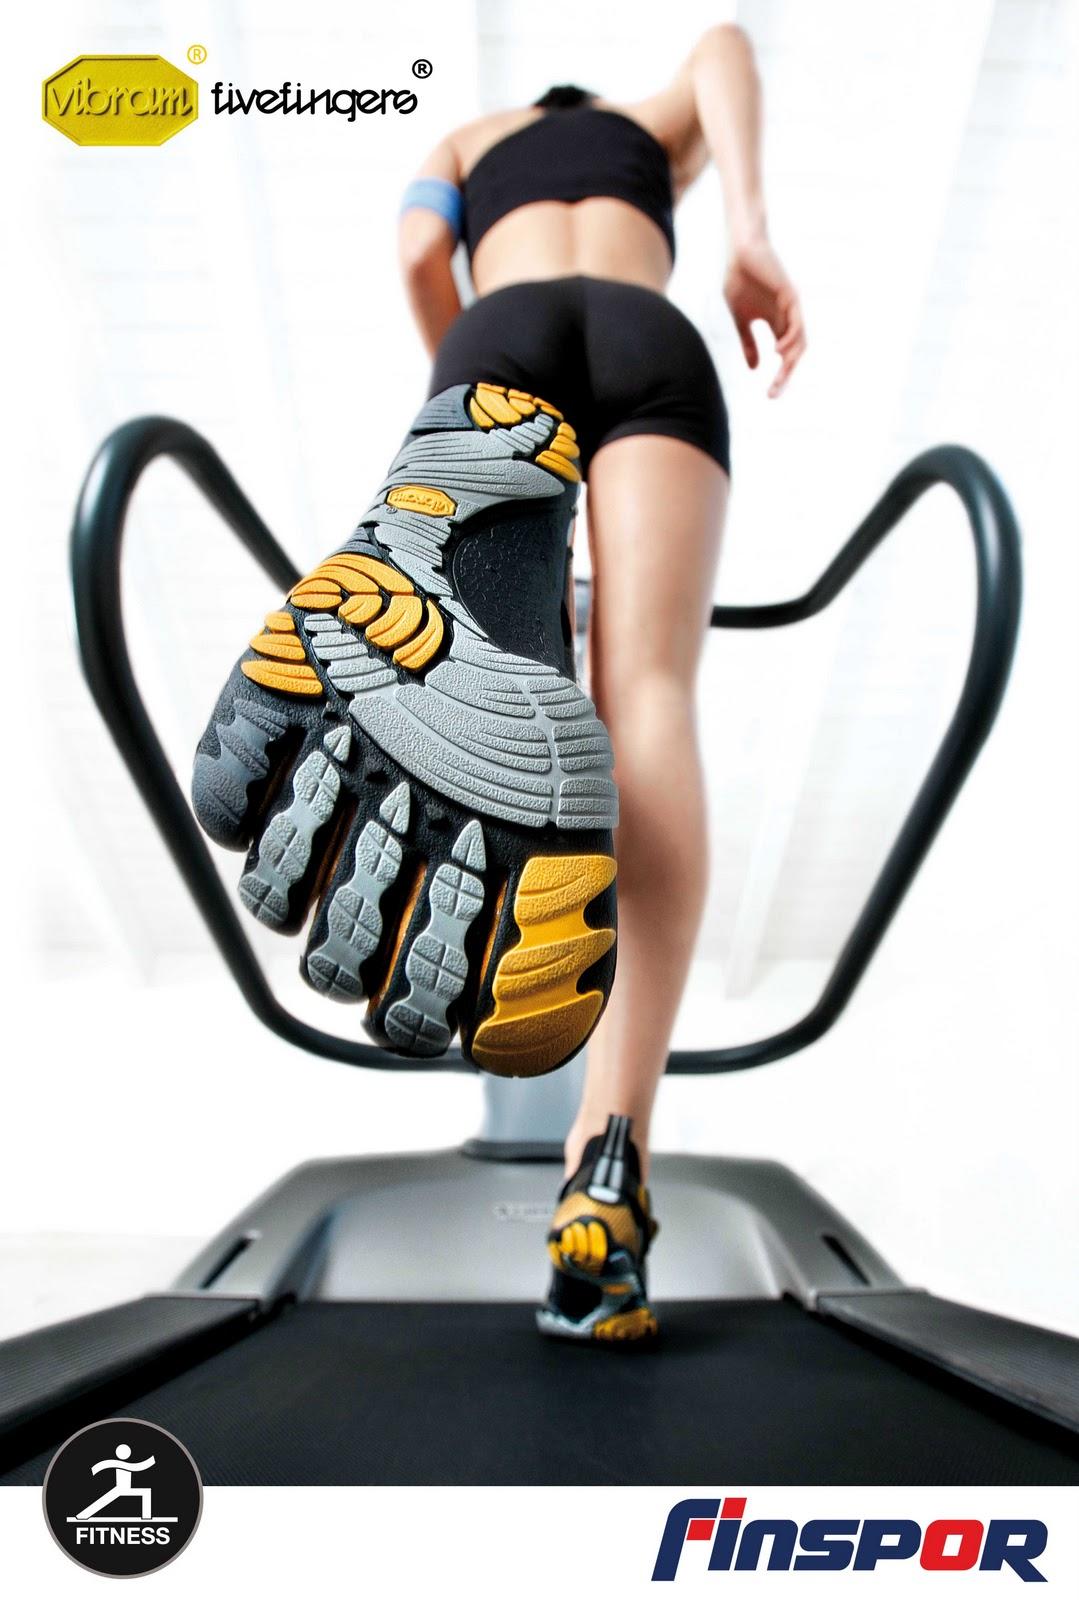 http://3.bp.blogspot.com/-izO_ydLD2Ig/TysN29-190I/AAAAAAAACd0/vfzJ1xJOyCE/s1600/pop_fitness.jpg